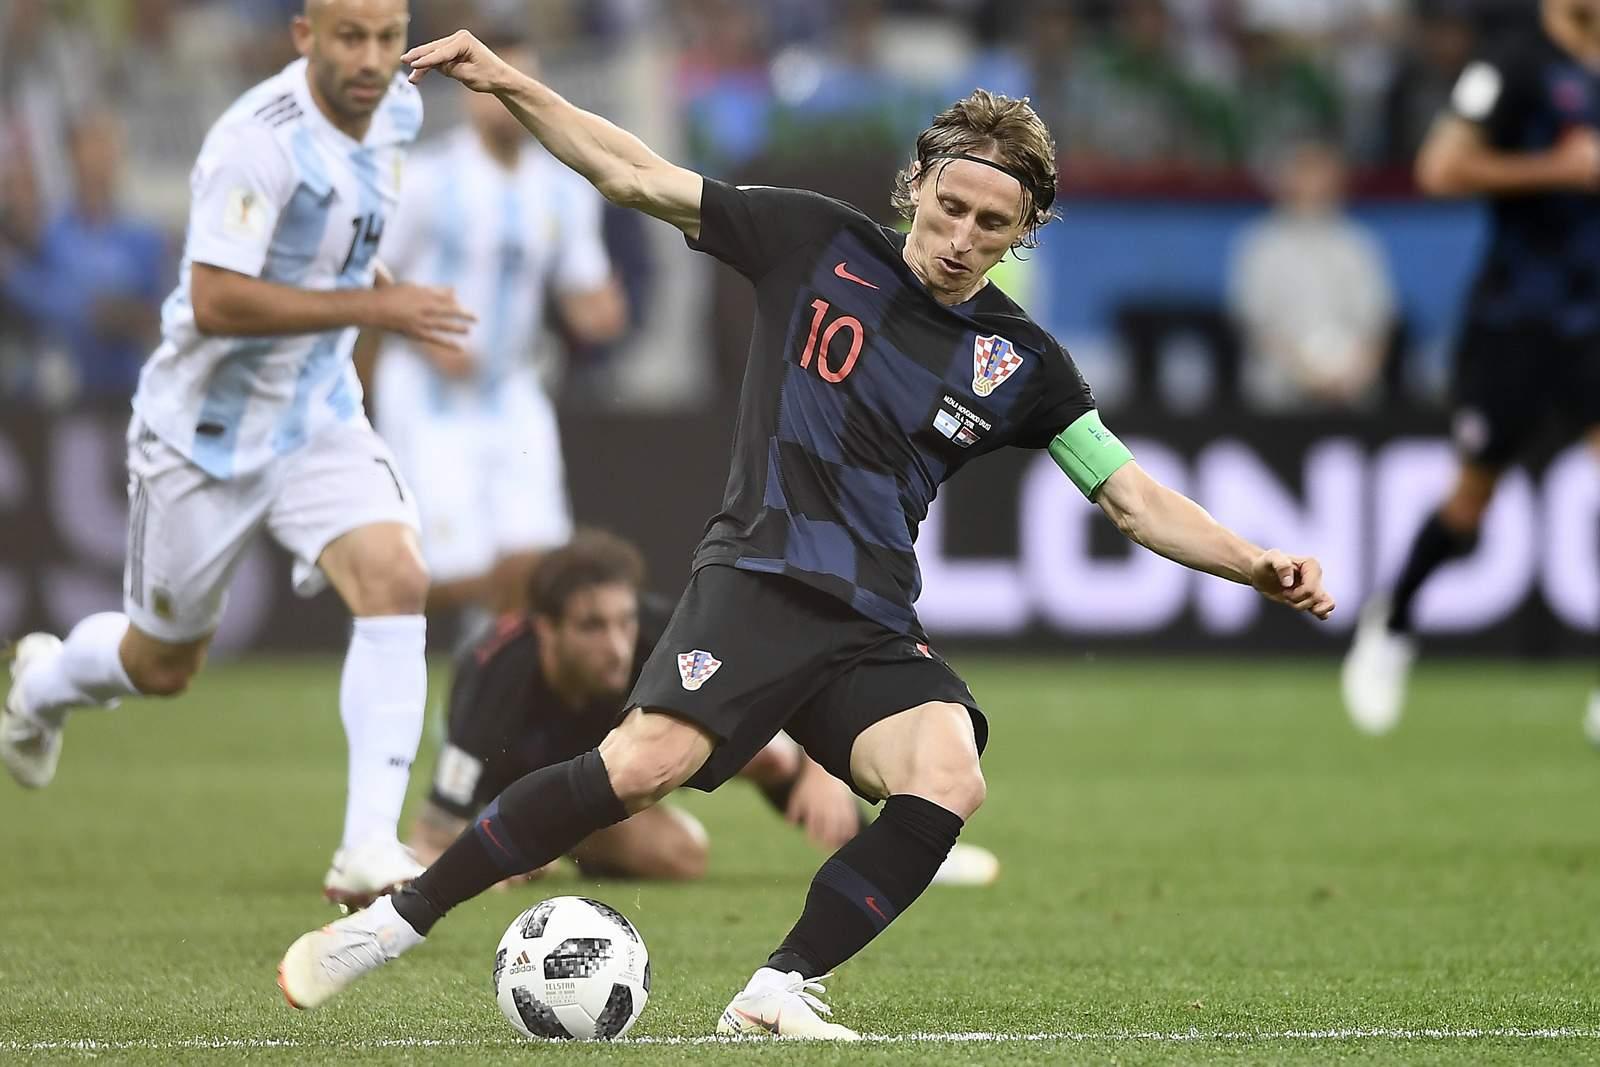 Luka Modric zieht ab. Jetzt auf Kroatien gegen Dänemark wetten.